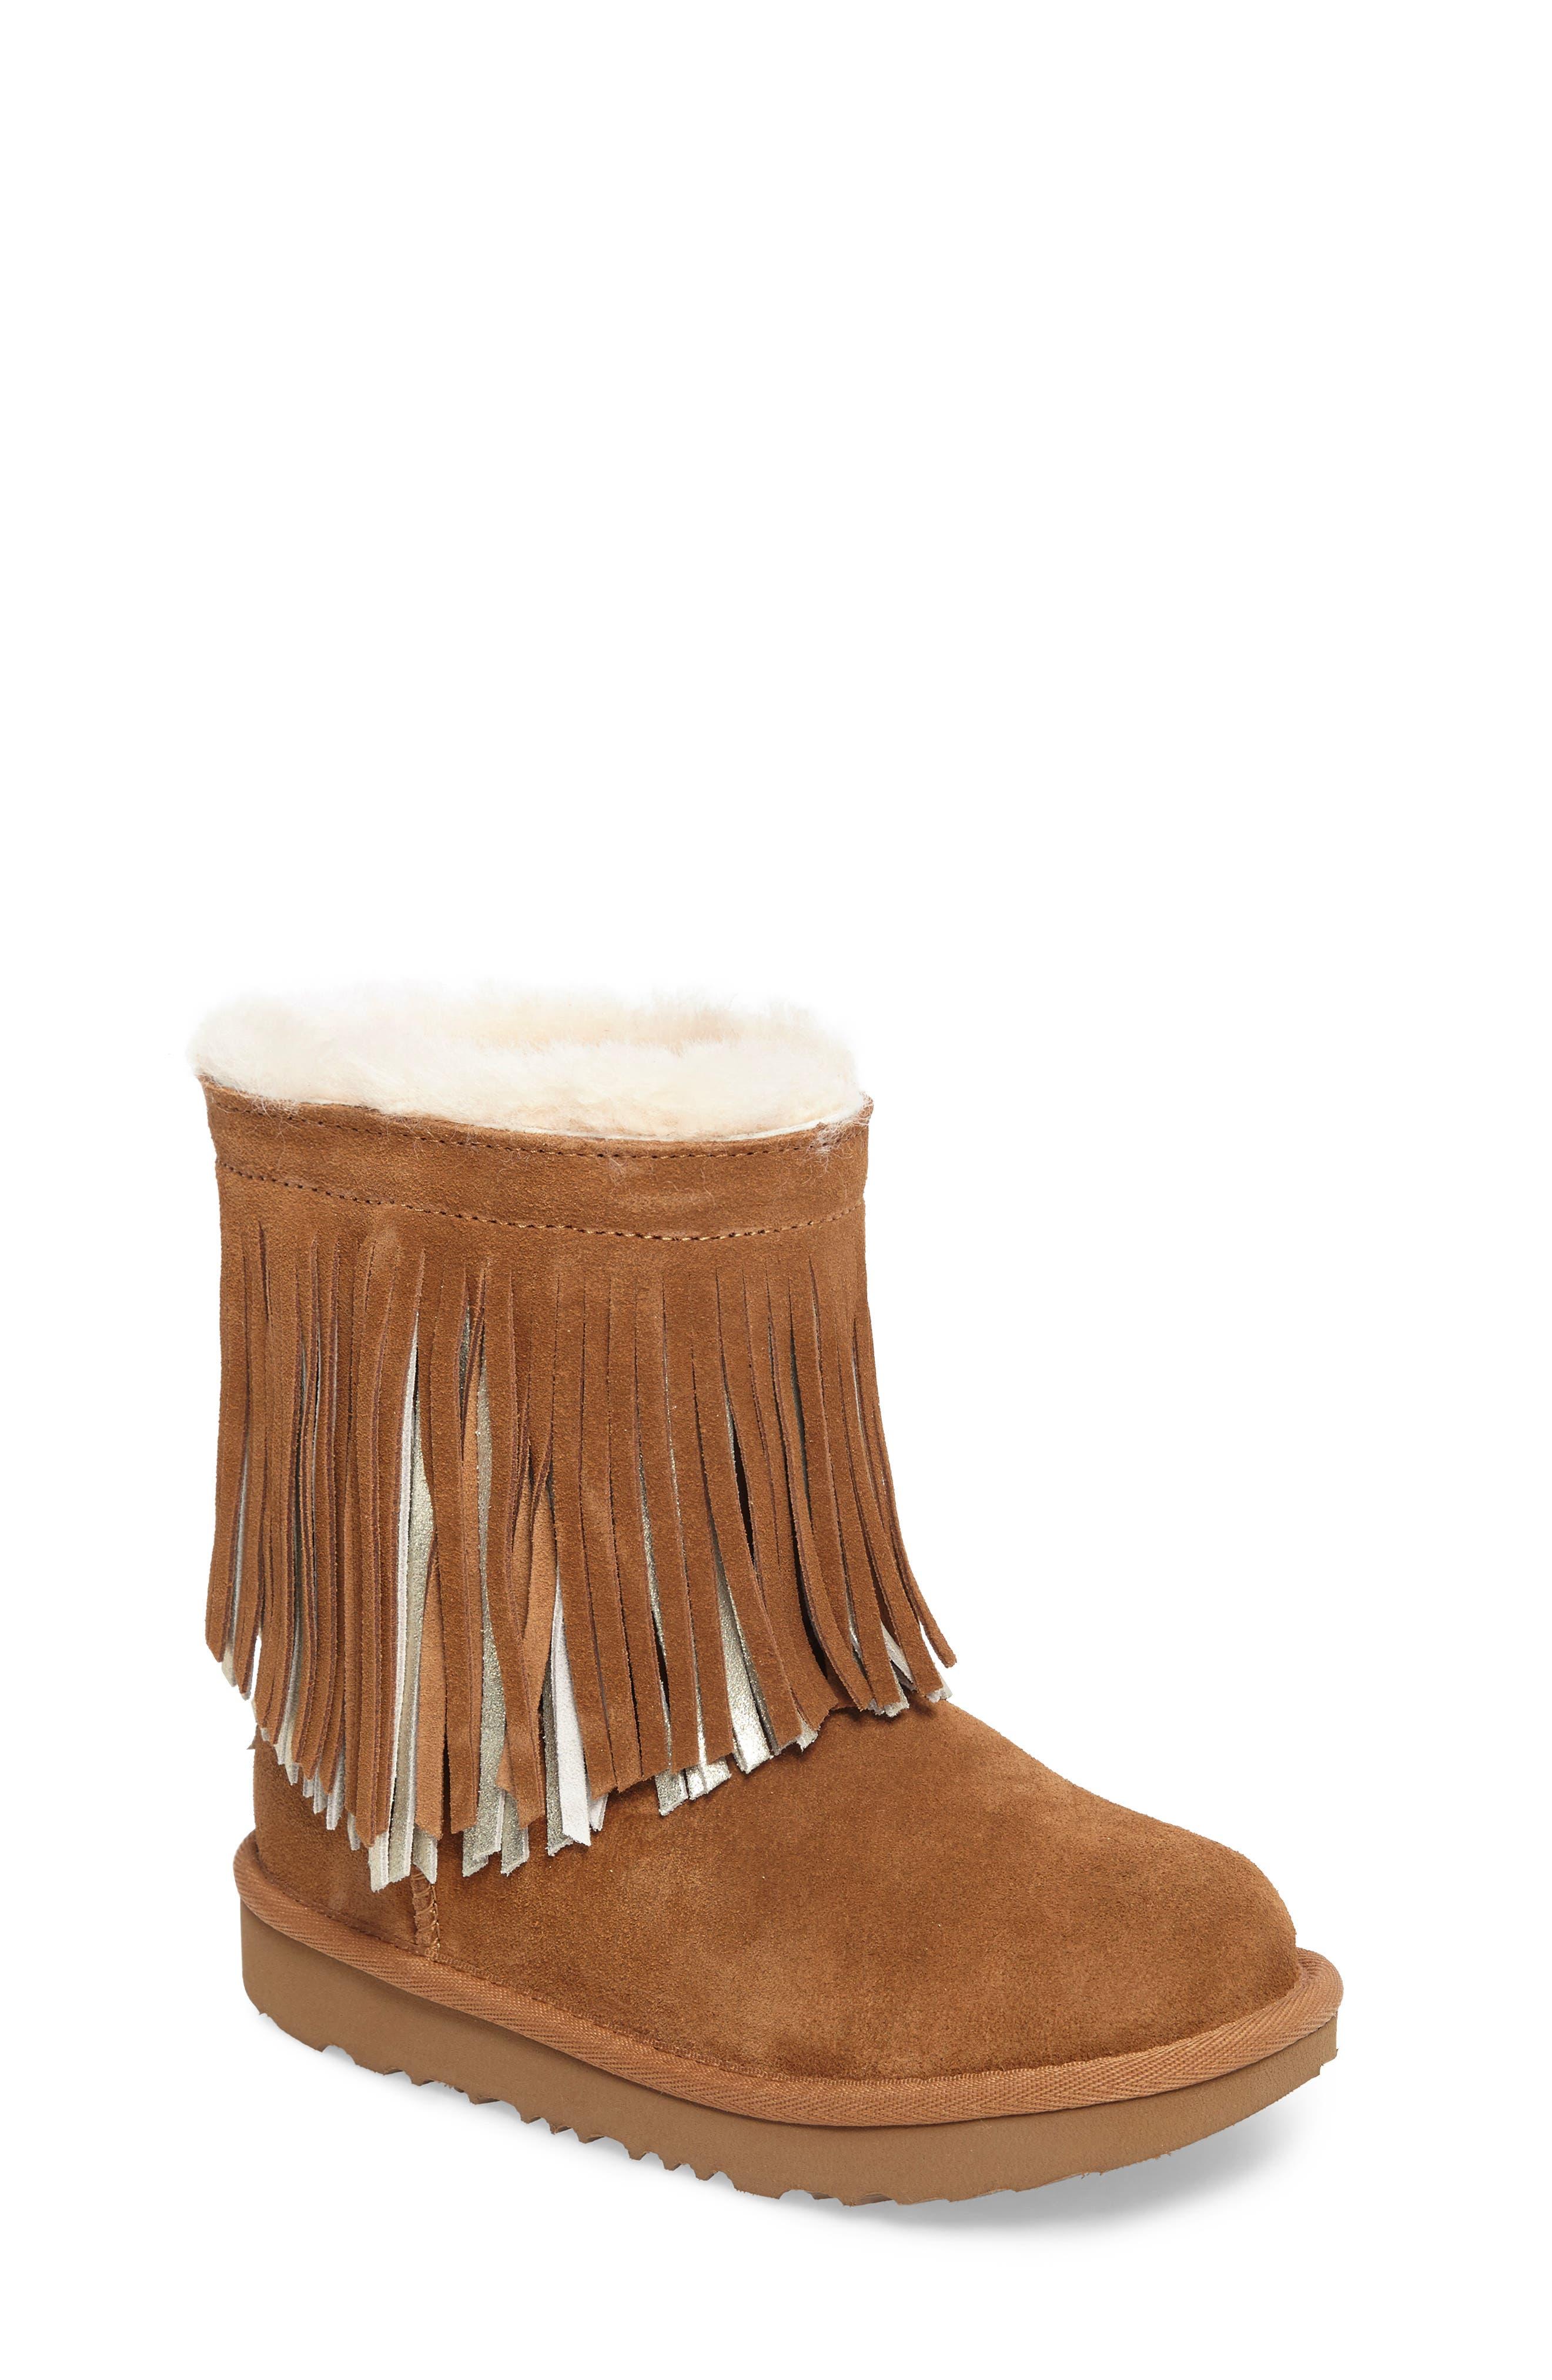 Alternate Image 1 Selected - UGG® Classic II Short Fringe Water Resistant Genuine Shearling Boot (Walker, Toddler, Little Kid & Big Kid)